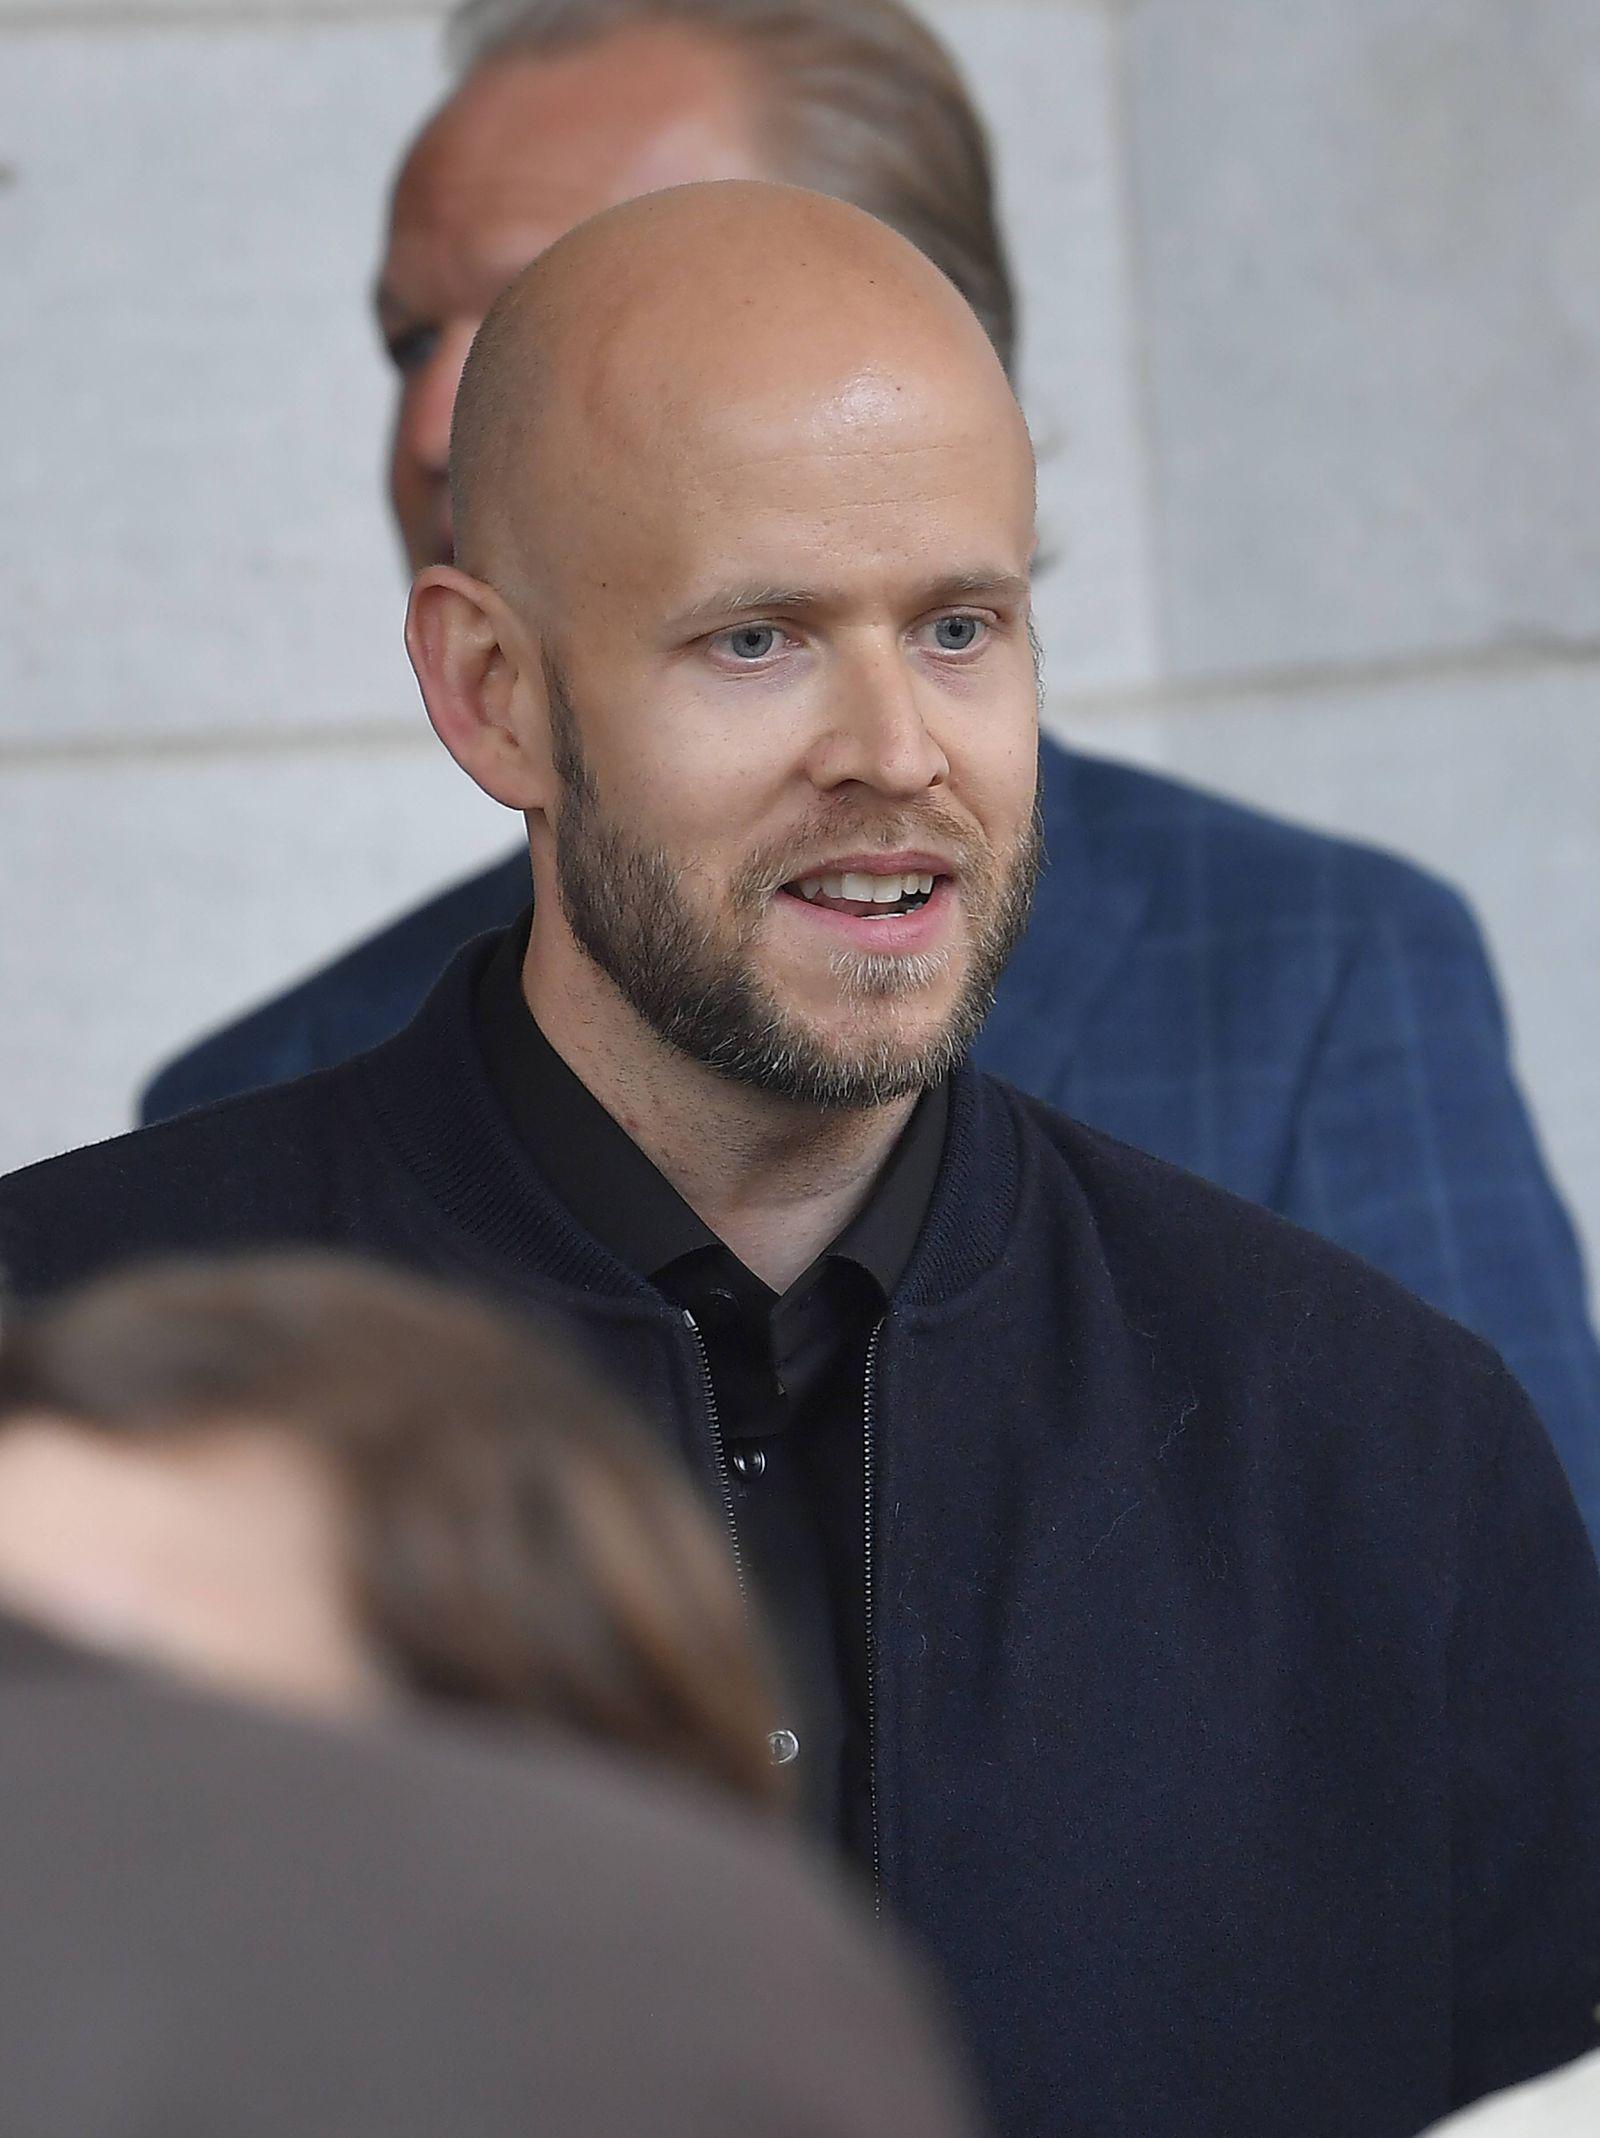 Spotify founder Daniel Ek arrives to the Brilliant Minds conference at Grand Hotel in Stockholm Swe